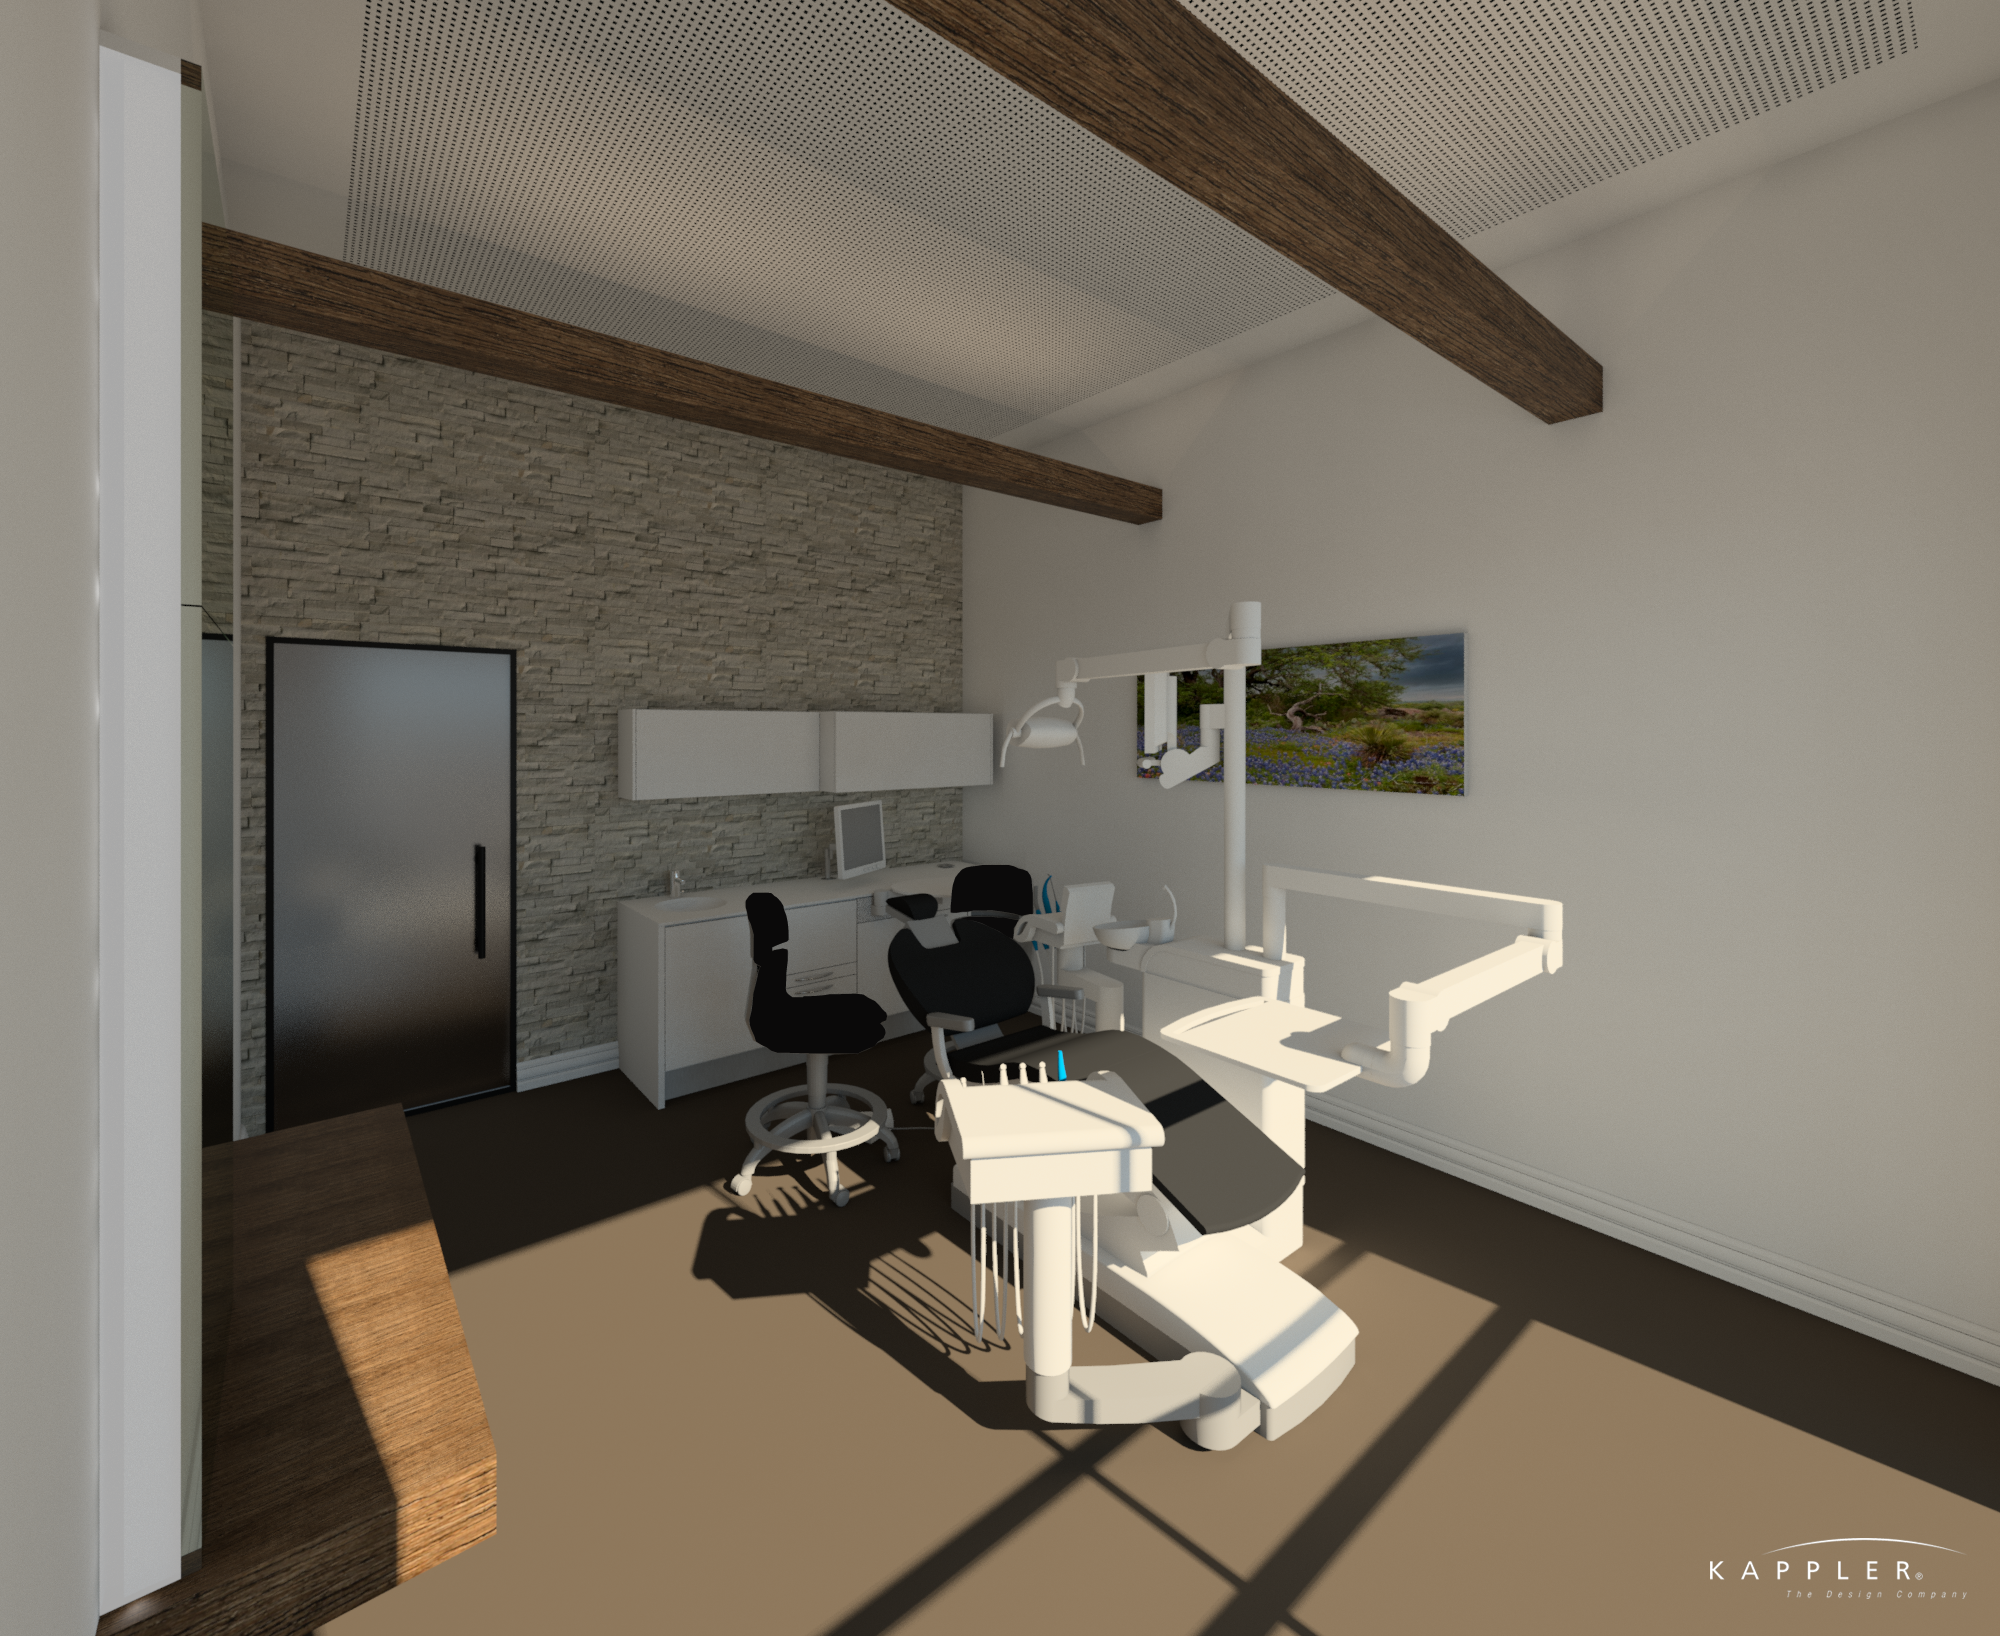 traditional dental operating room design concept